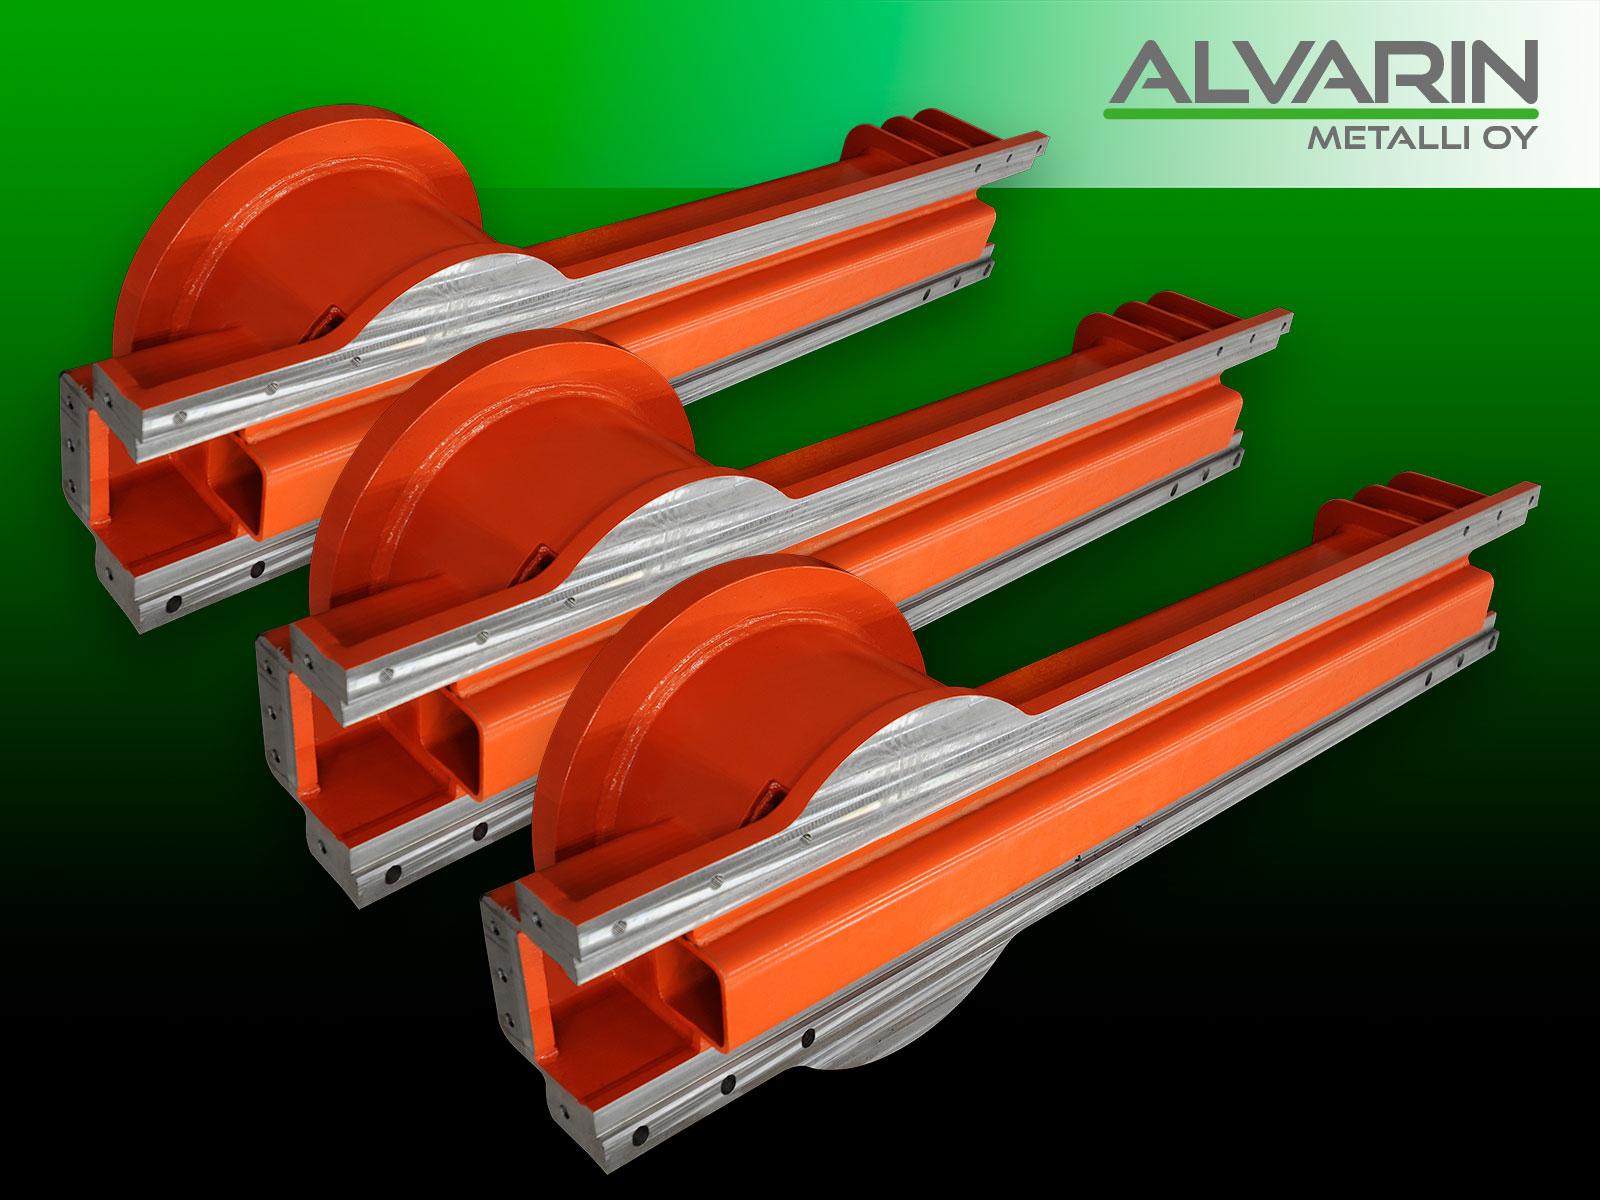 Alvarin_Metalli_alihankinta-konepaja-metalliteollisuus-referenssit_kappale_7